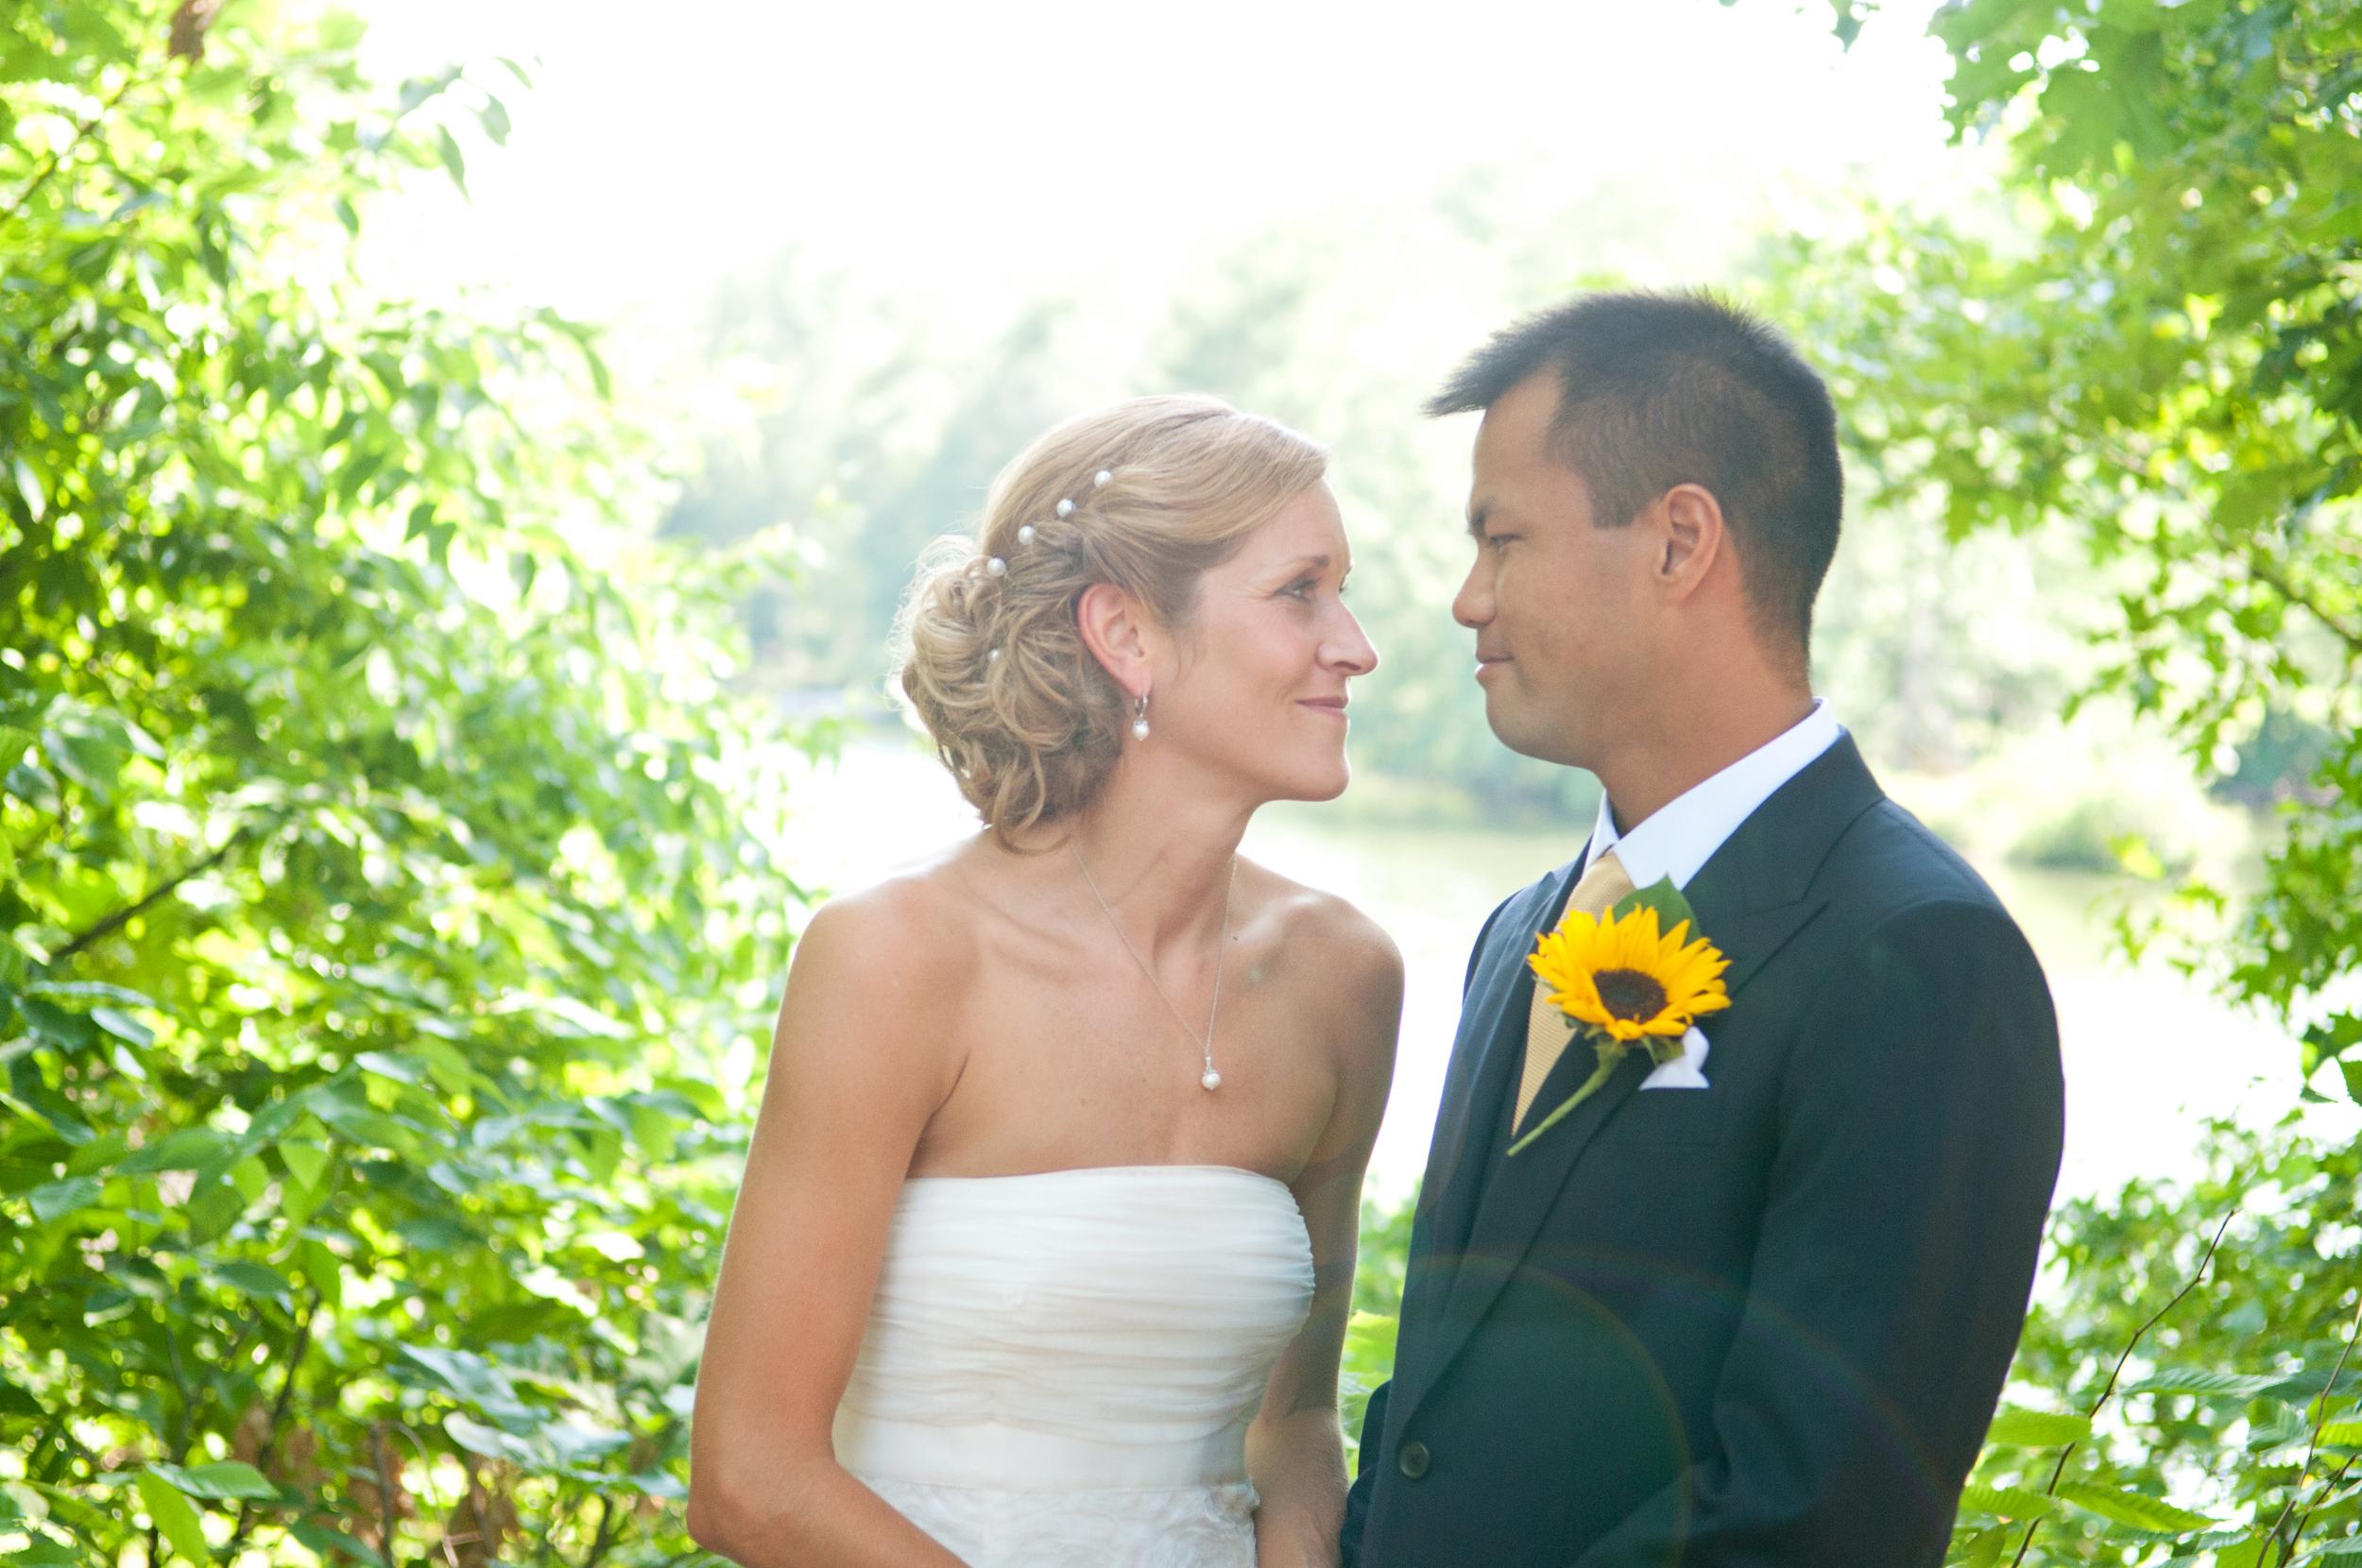 Angela_Chicoski_CT_wedding_photographer_021.jpg